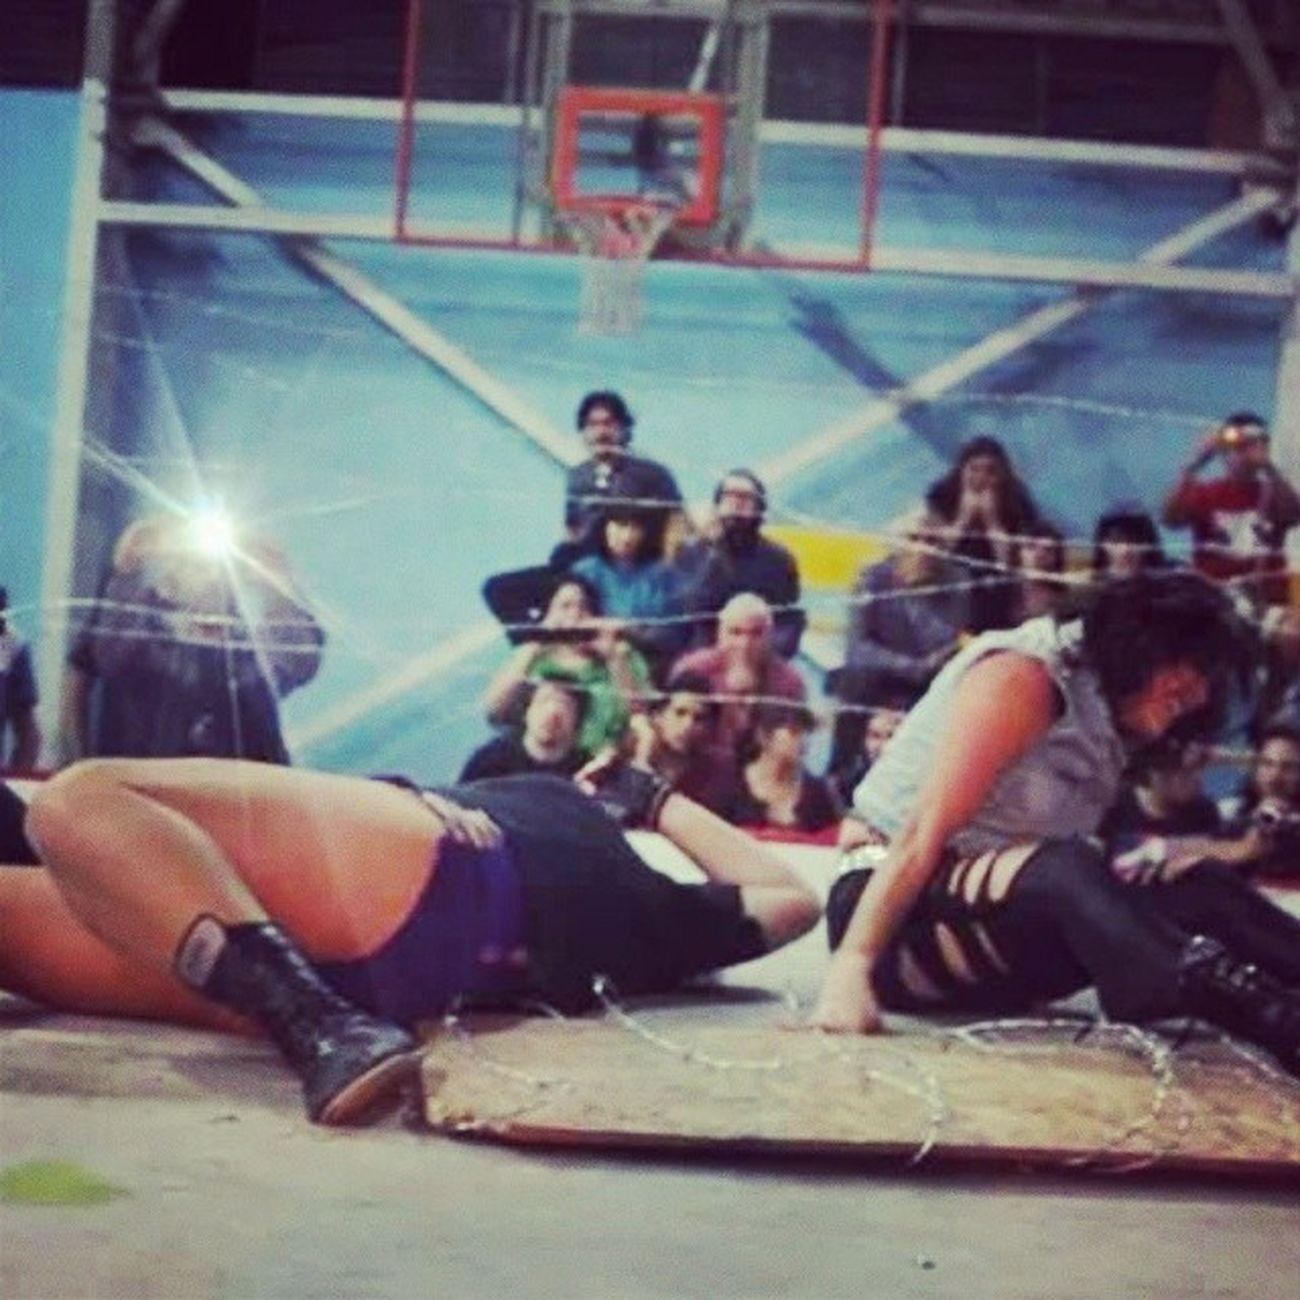 Engel vs Domina última lucha ?!?! Xnl Alambredepuas wrestling